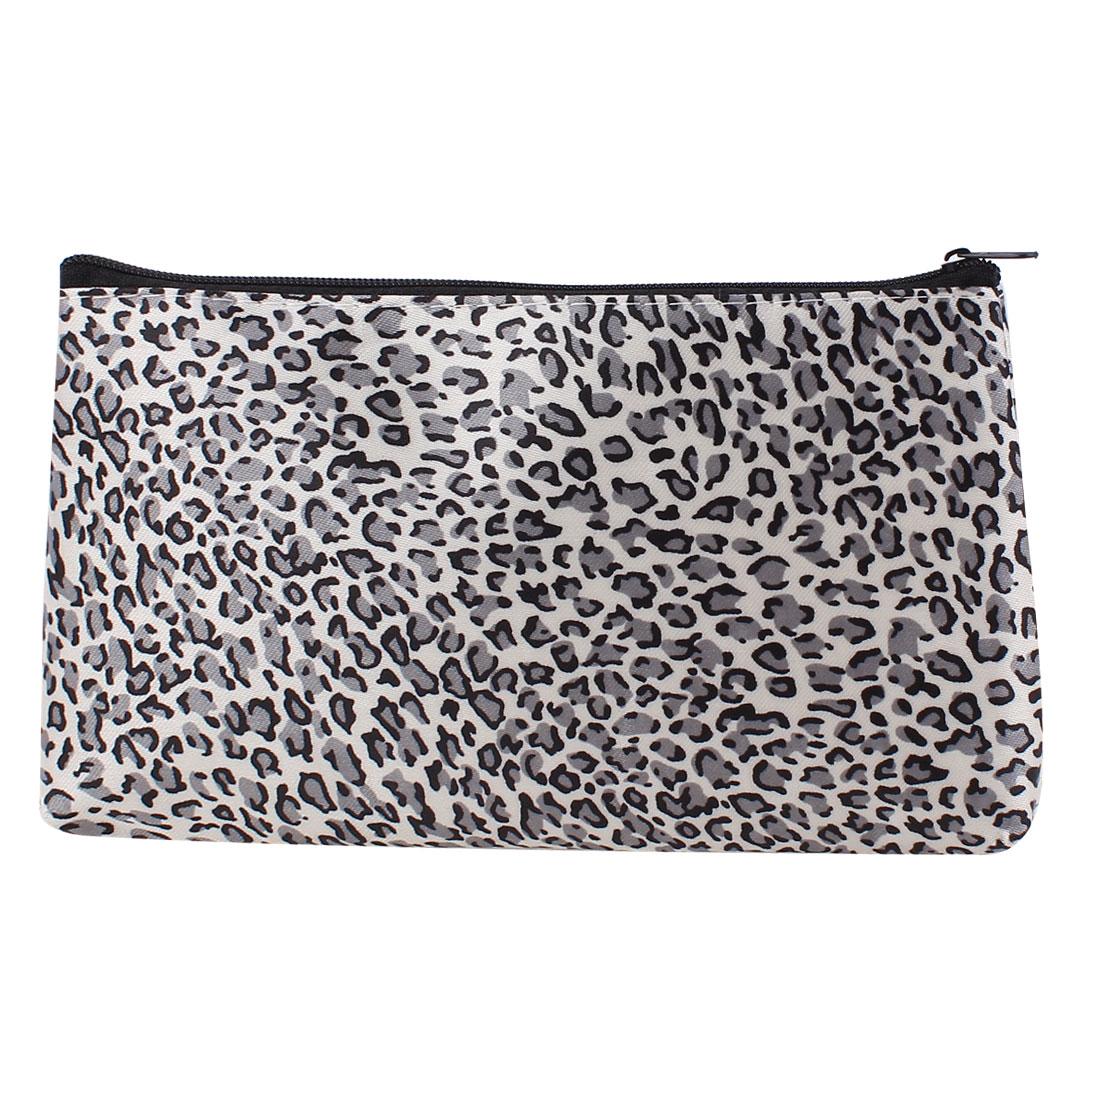 Woman Leopard Print Zip Up Rectangular Makeup Holder Cosmetic Pouch Bag